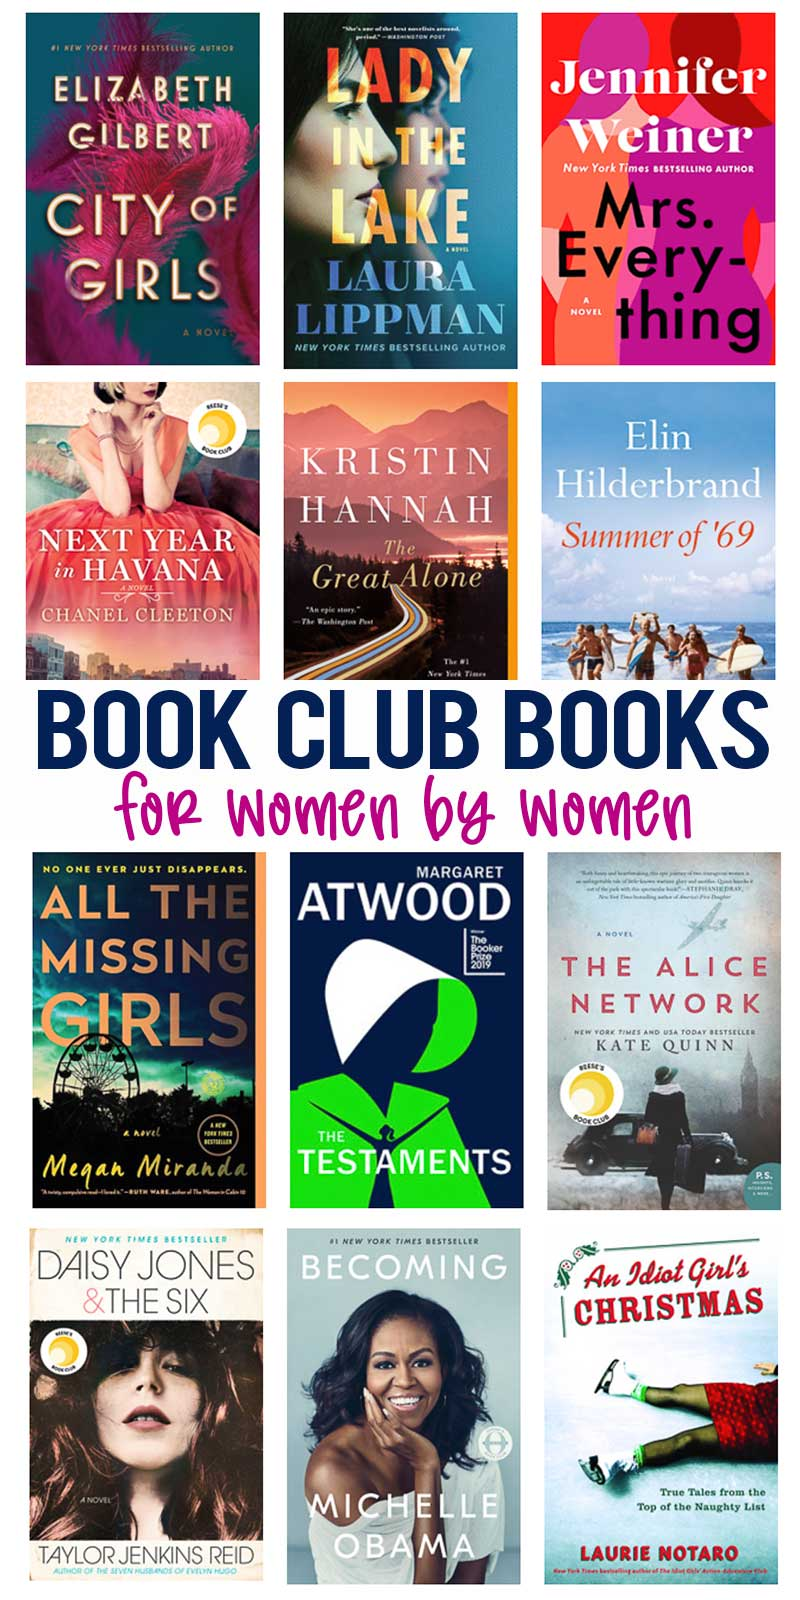 Best Book Club Books For Women By Women Online Book Club Book Club Reads Book Club Books